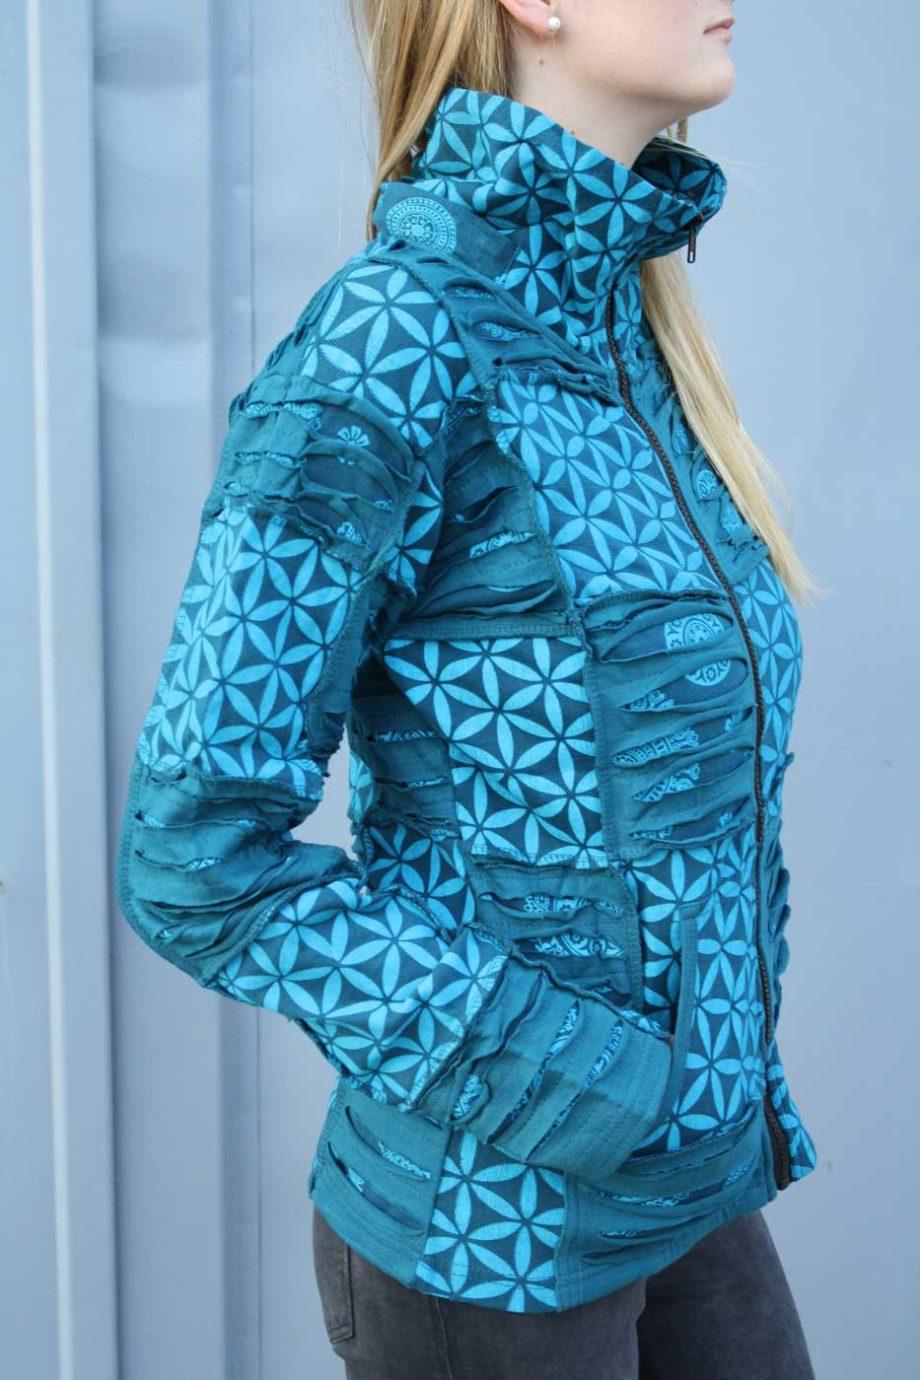 Goa-Jacke mit Zipfel-Kapuze Damen Petrol | Patchwork